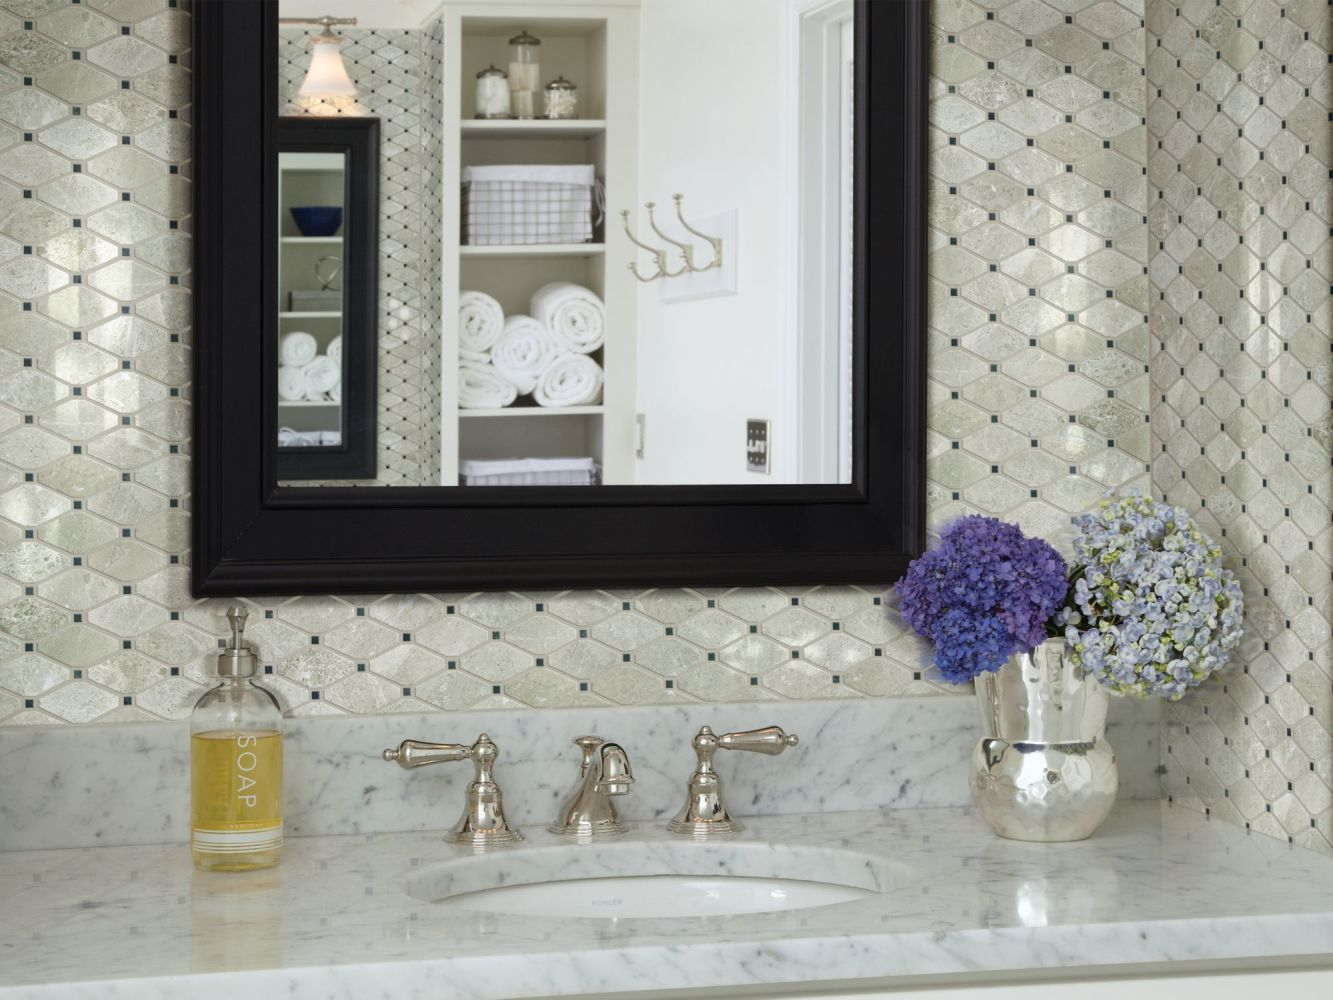 Shaw Floors Toll Brothers Ceramics Hamptons Diamond Plsh Mosaic Ritz Grey 00500_TL48B